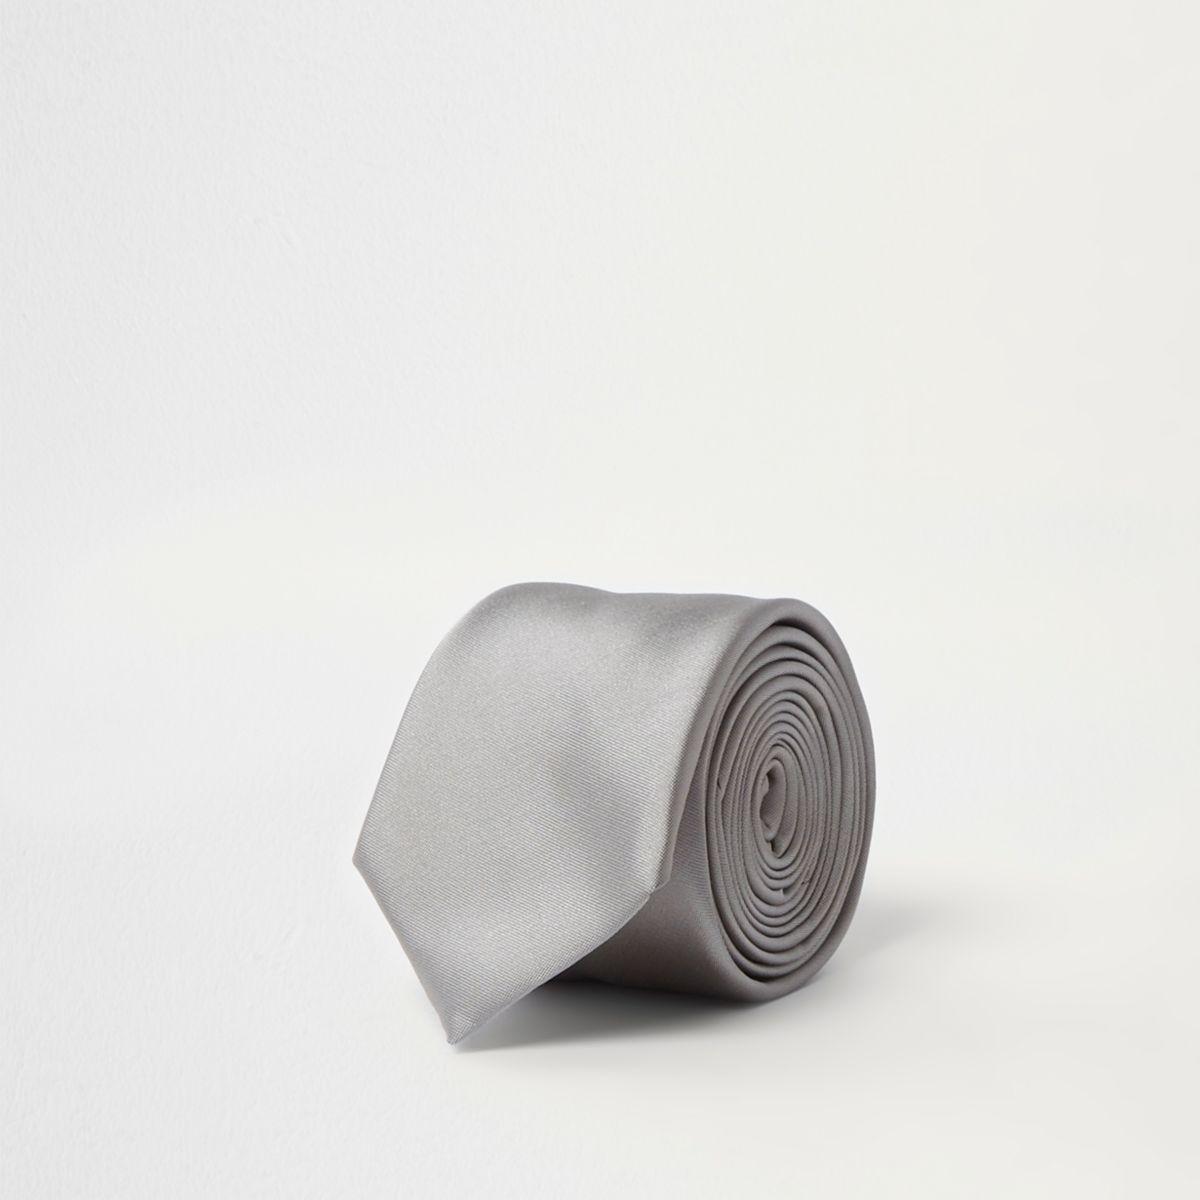 Silver satin pin tie